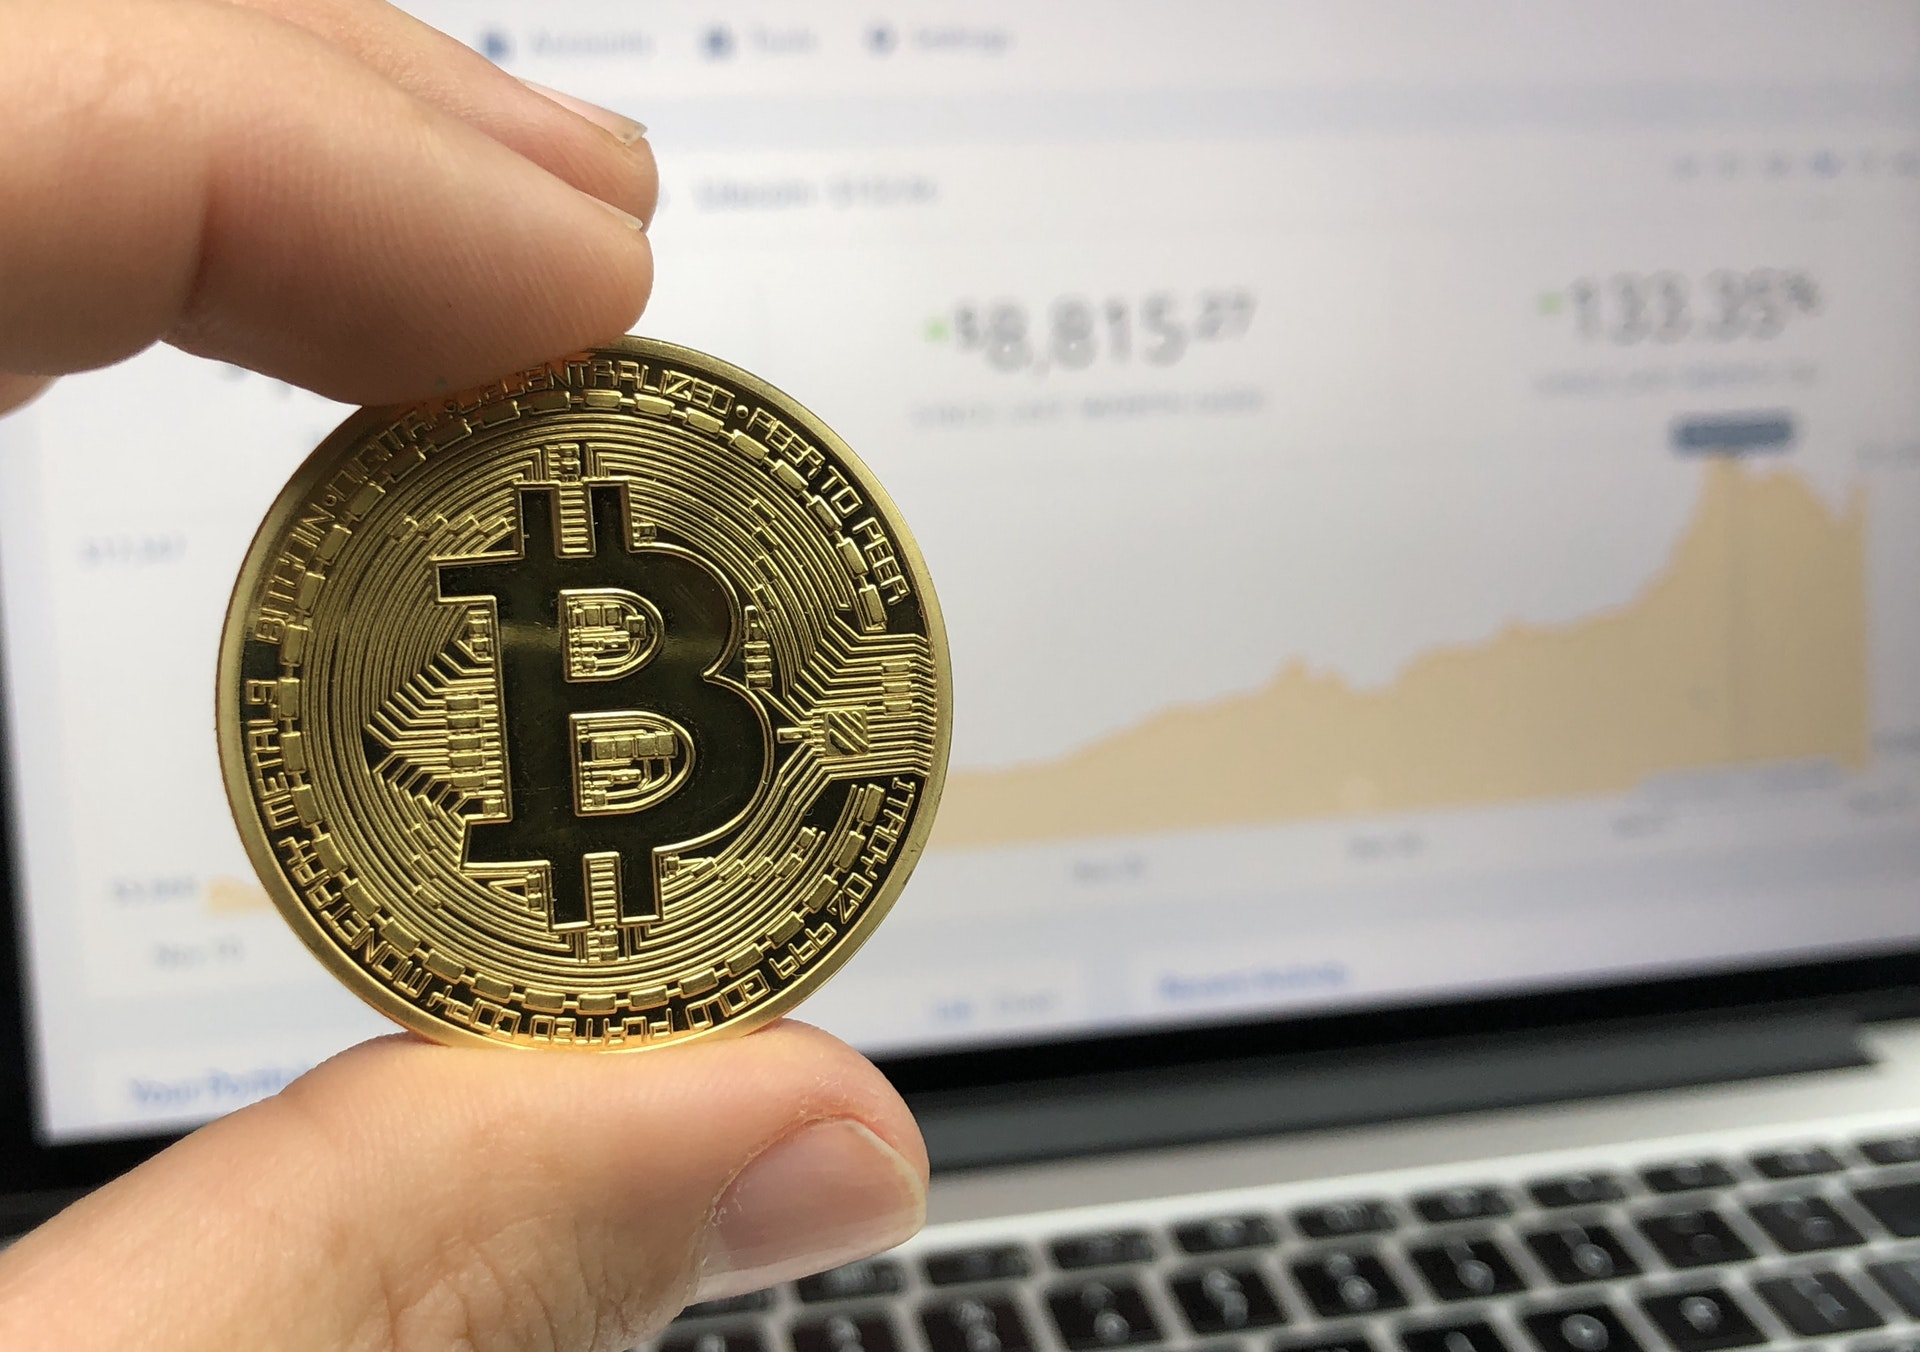 Kto stoi za Bitcoinem? Historia kryptowaluty BTC